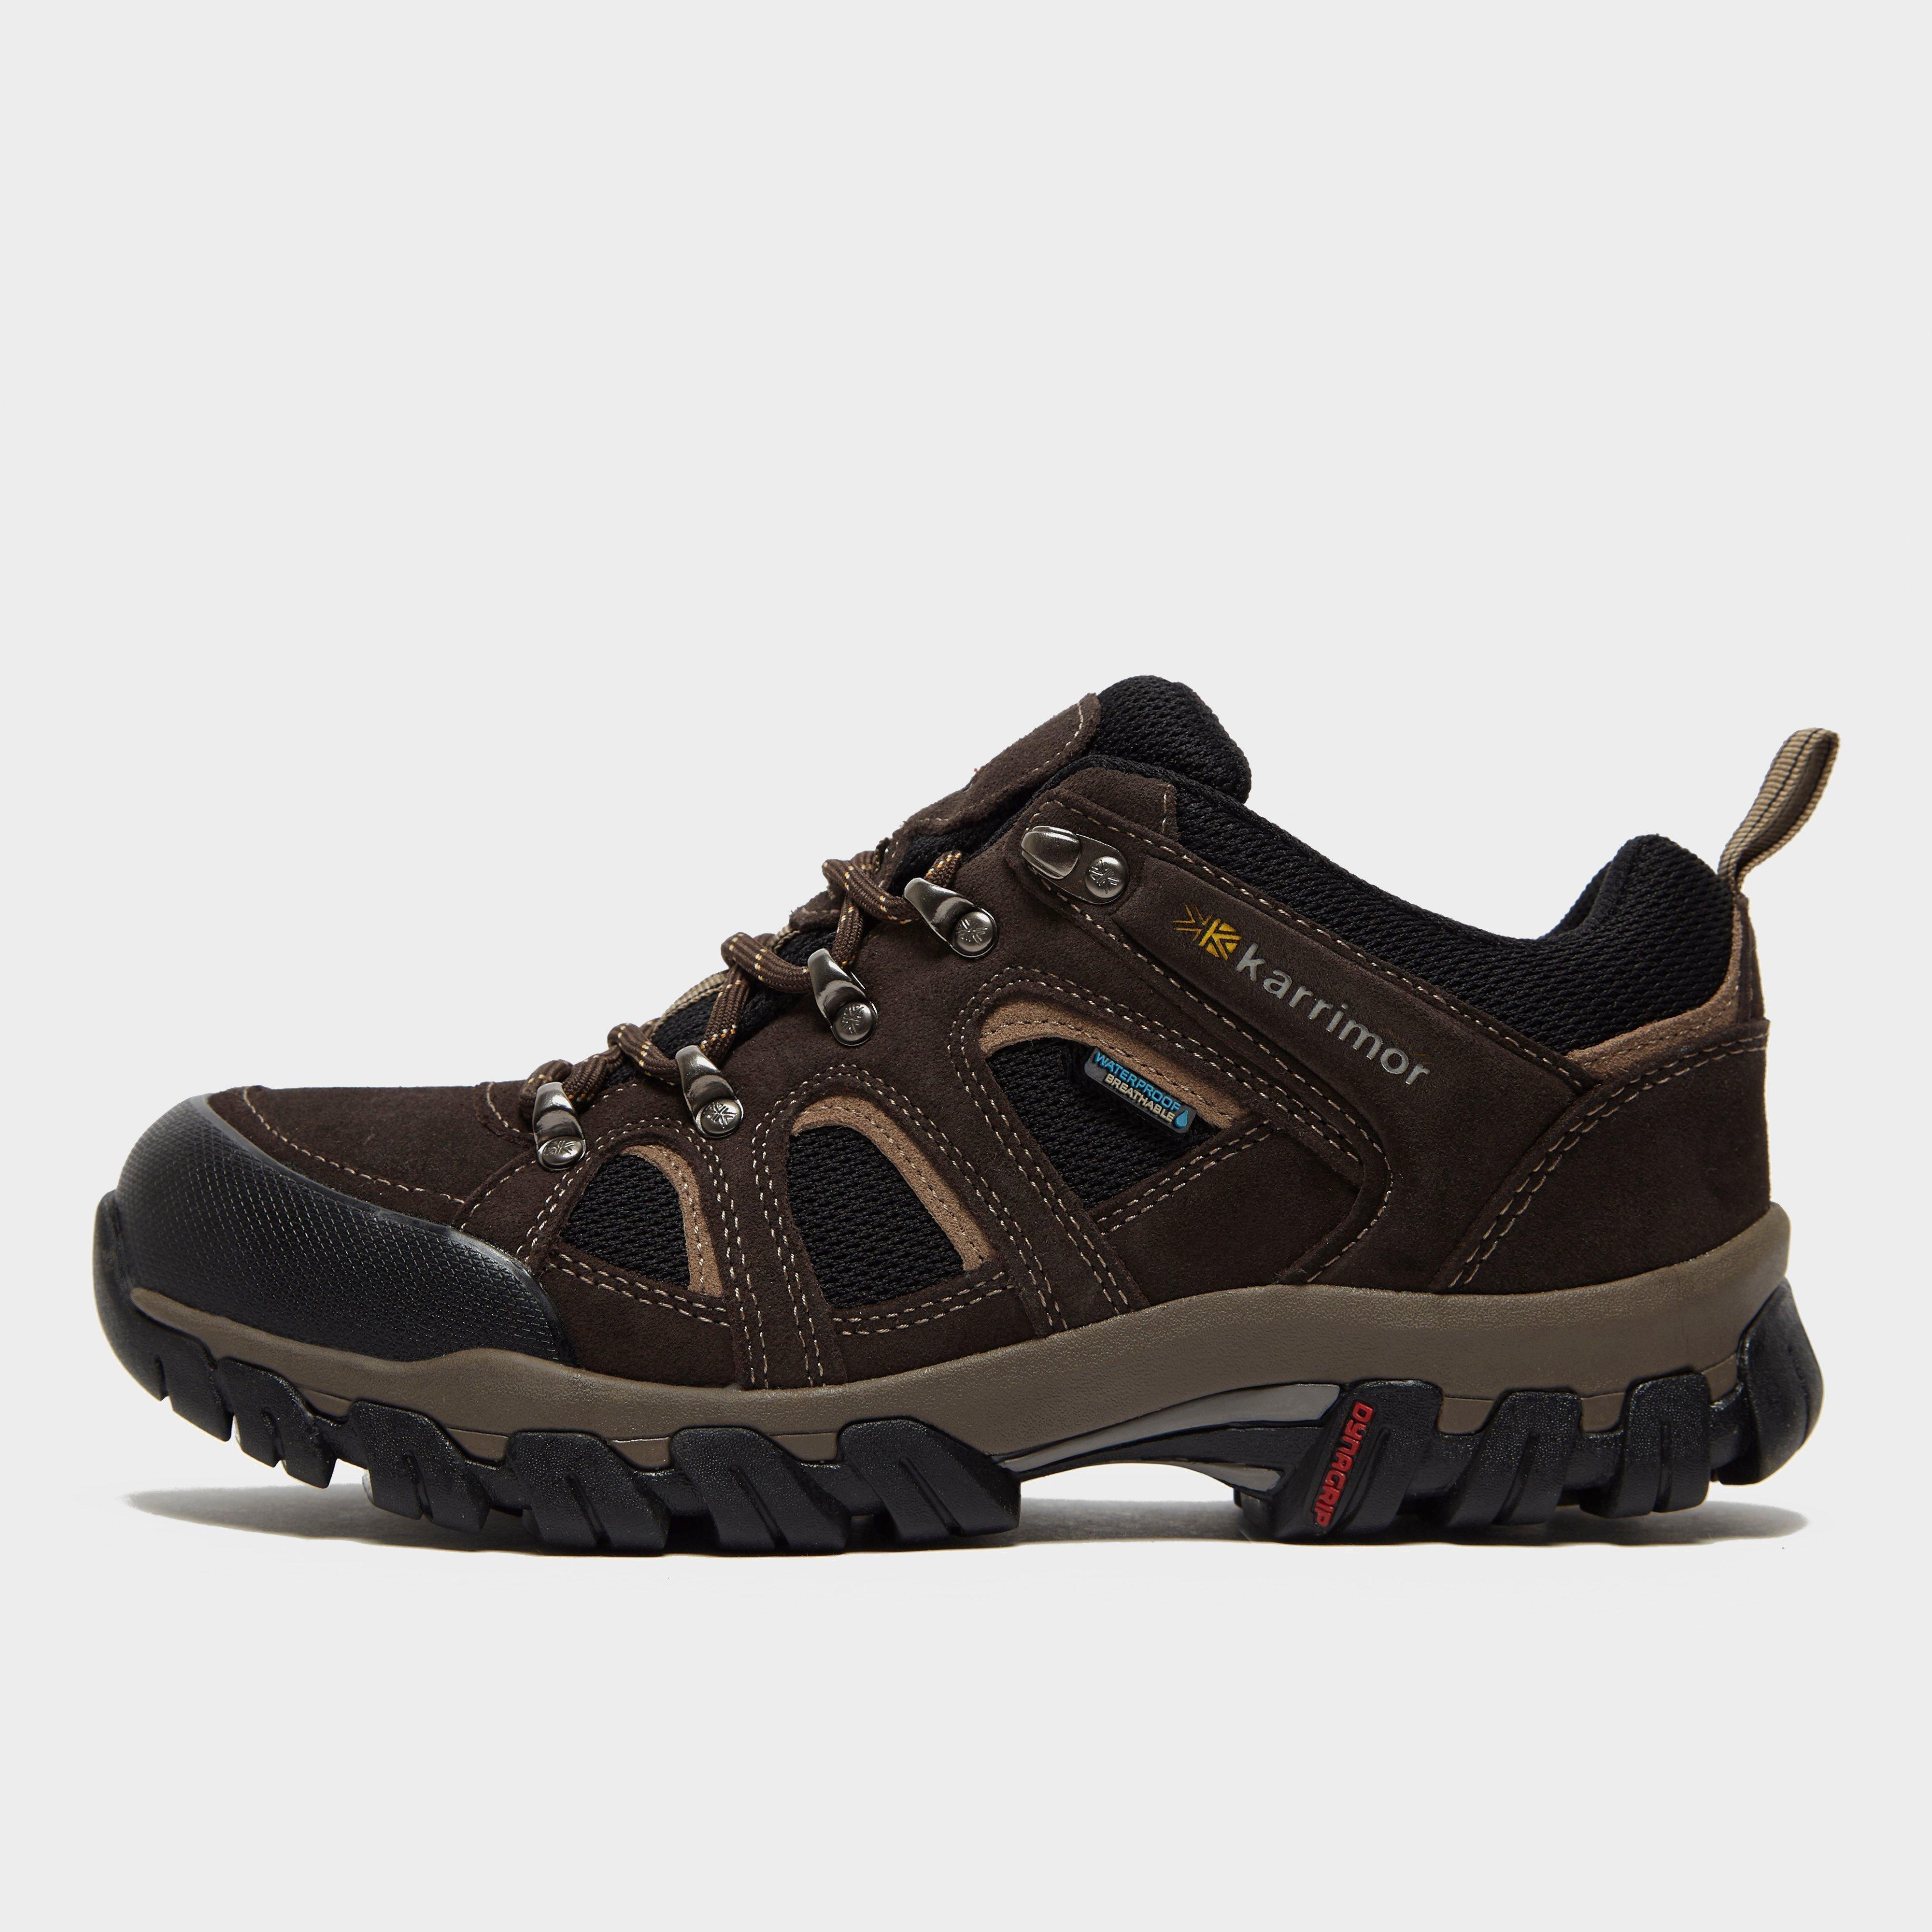 Karrimor Karrimor Mens Bodmin Low Weathertite Trail Shoes